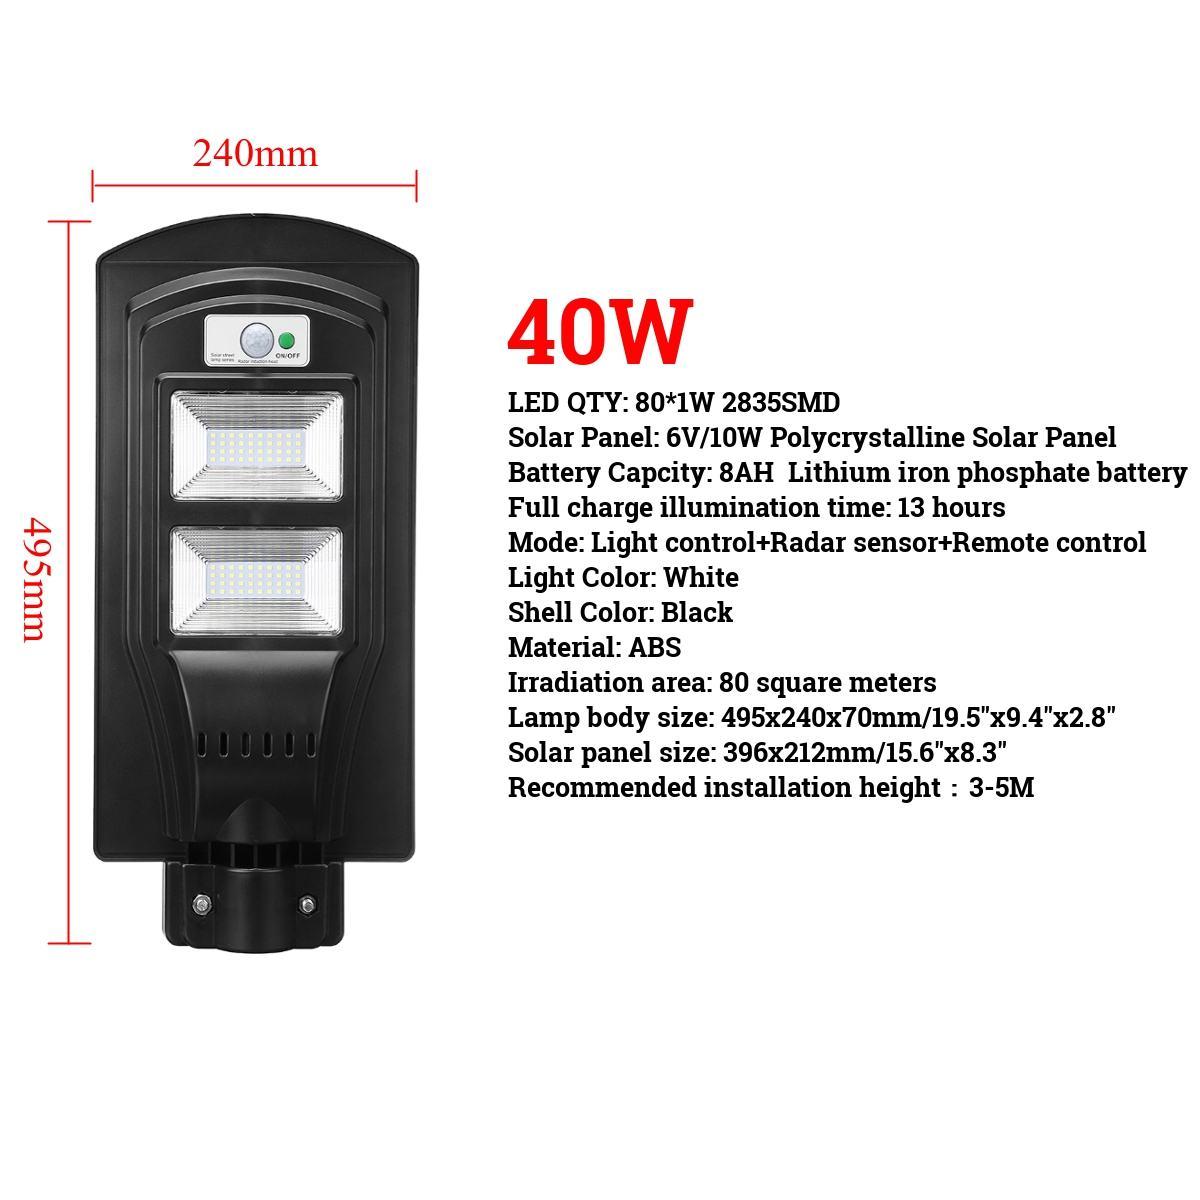 40/60/90W LED Wall Lamp IP65 Solar Street Light Radar motion 2 In 1 Constantly bright & Induction Solar Sensor Remote Control